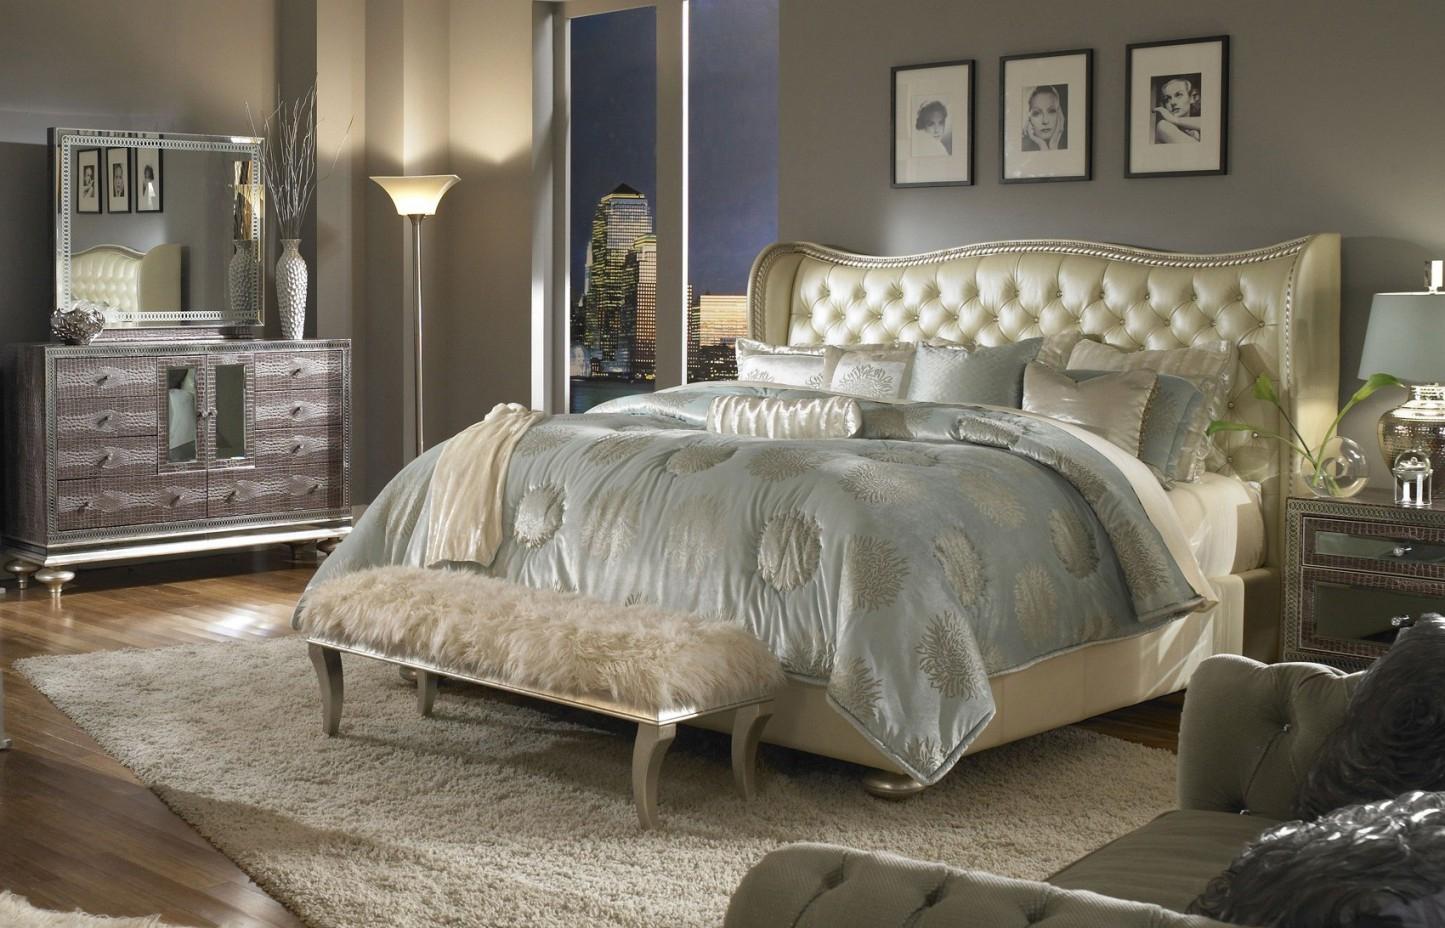 mirrored furniture bedroom designs photo - 4